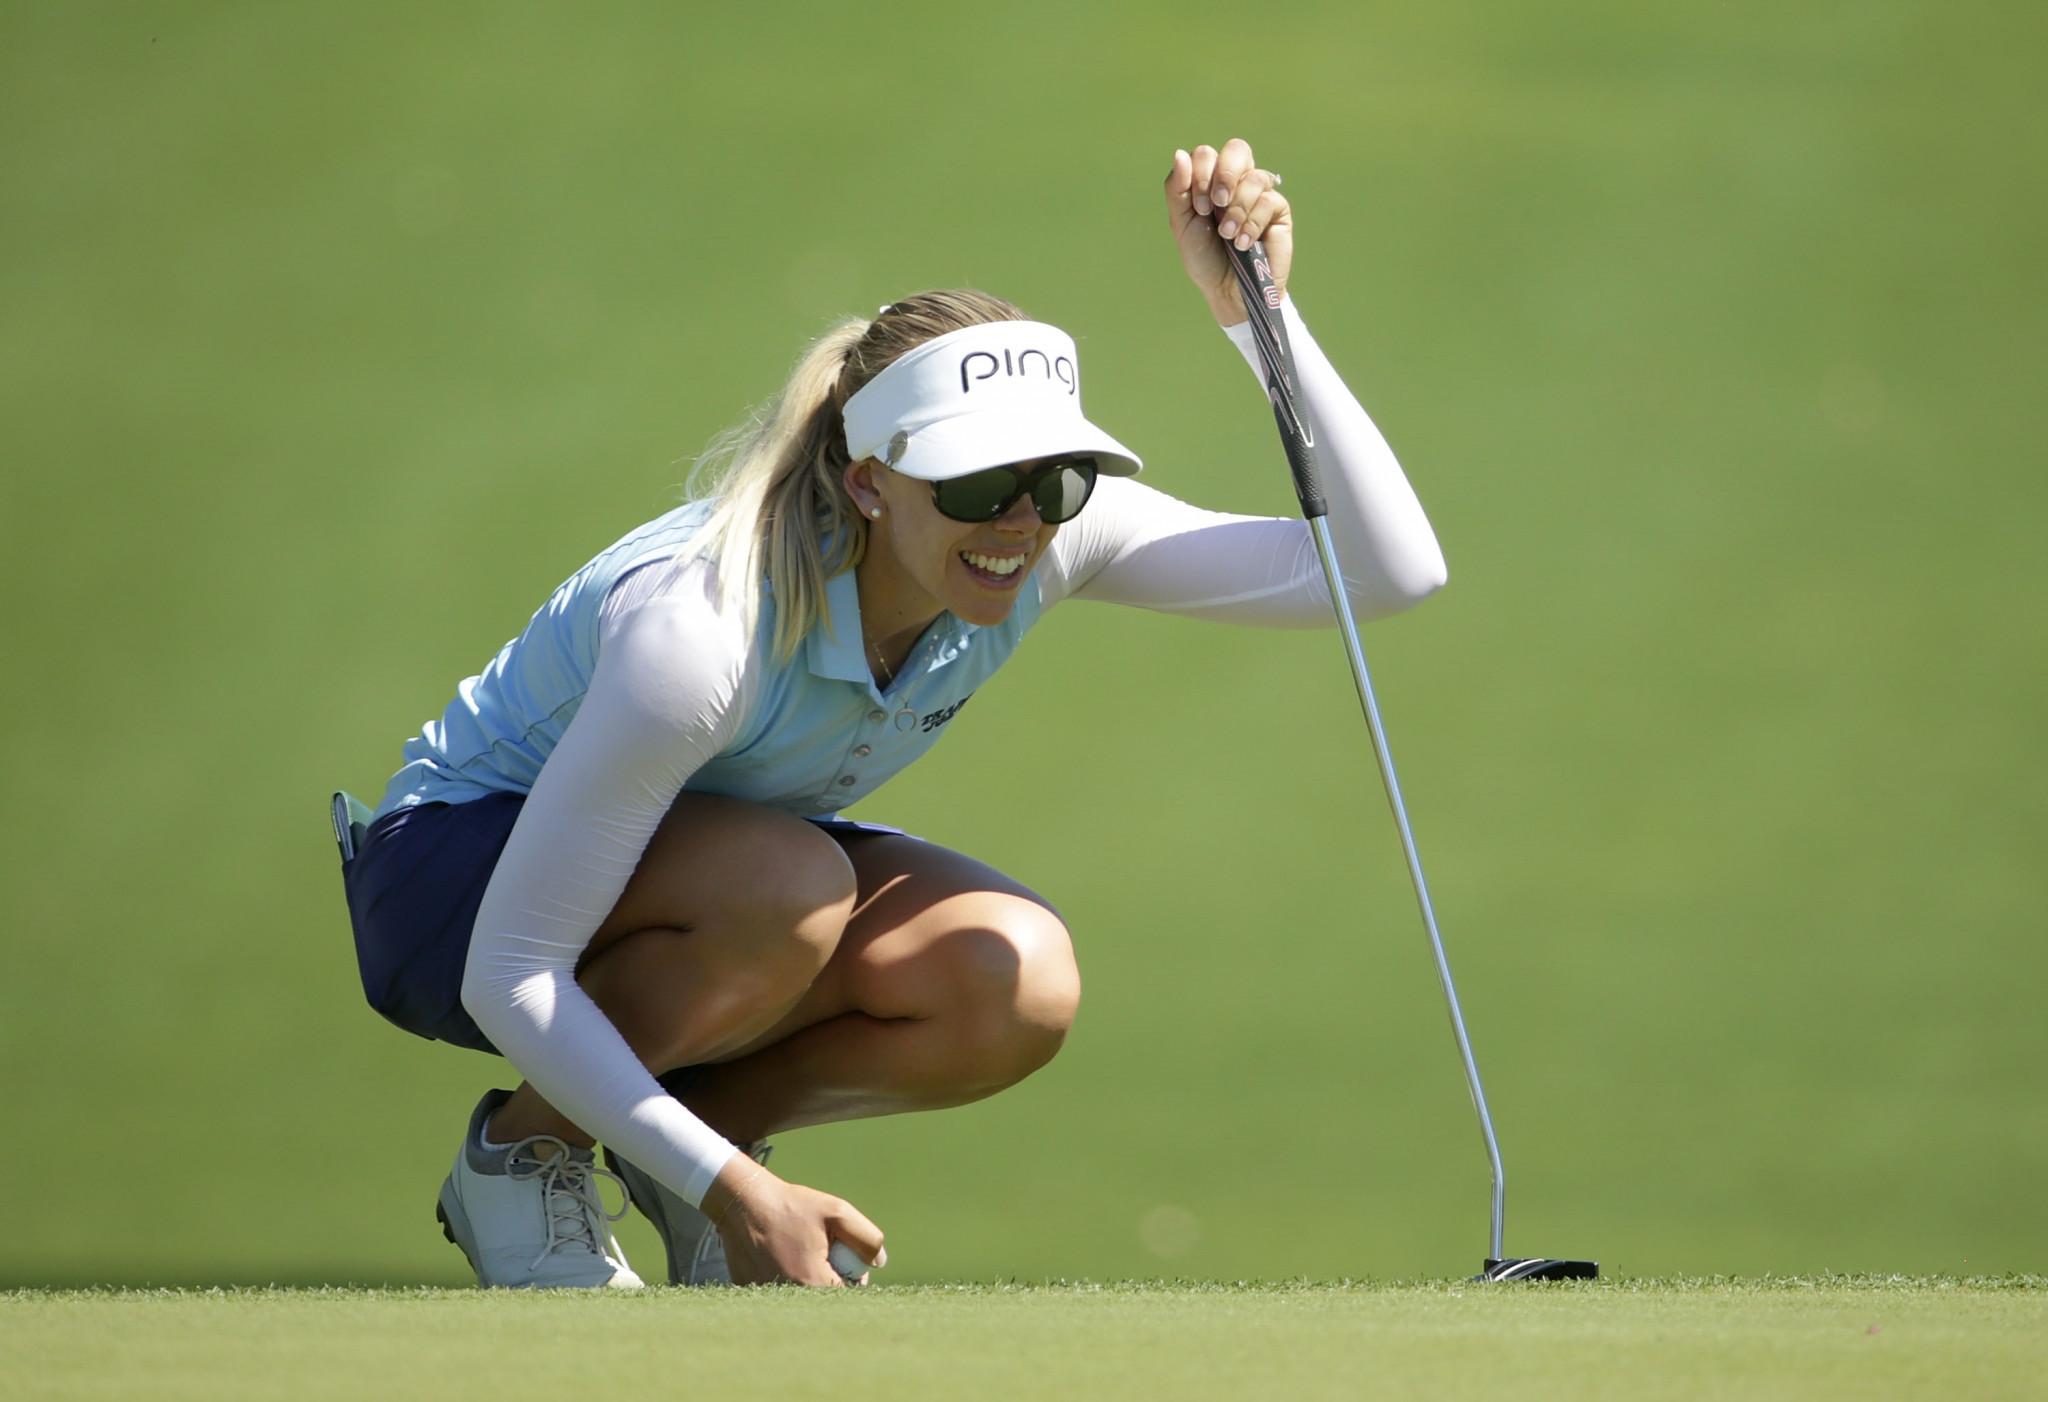 Lindberg takes three-shot lead into final day of ANA Inspiration